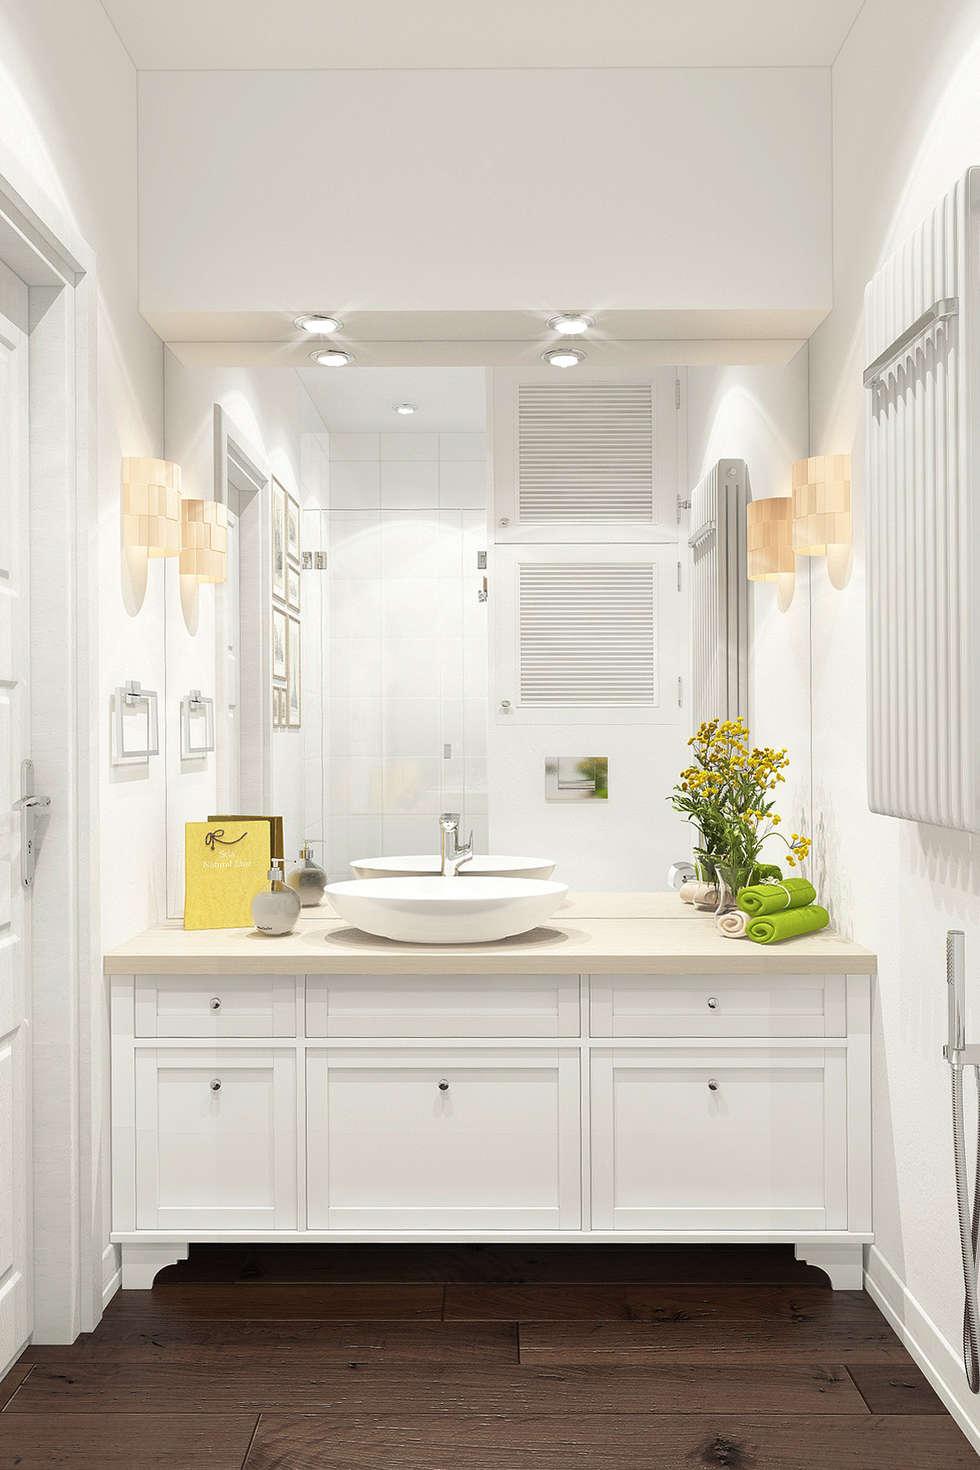 Skandinavische Badezimmer Bilder Von Reroom | Homify Skandinavische Badezimmer